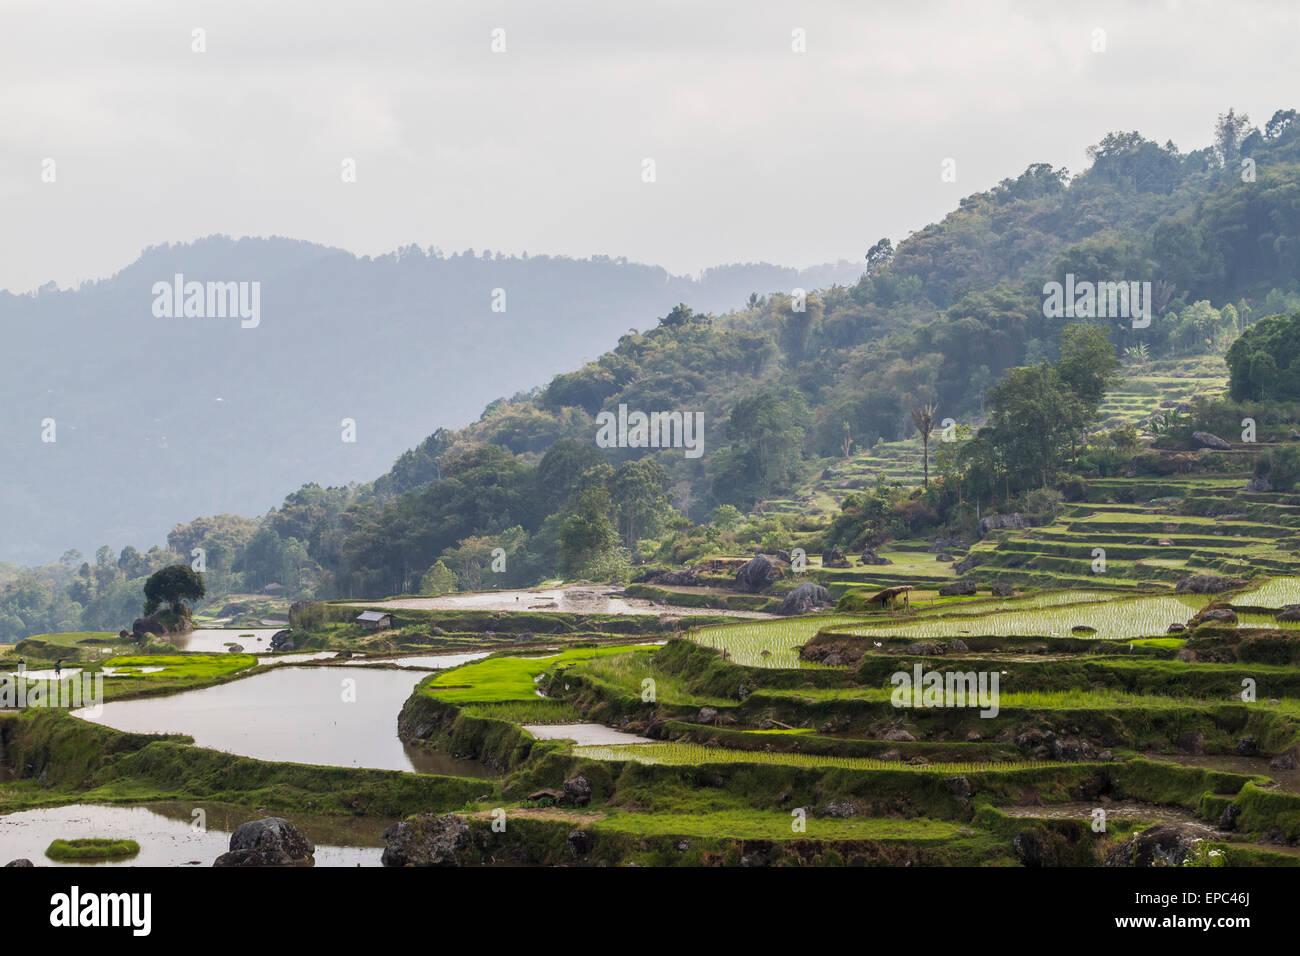 Terraced rice fields, Batutumonga, Toraja Land, South Sulawesi, Indonesia - Stock Image